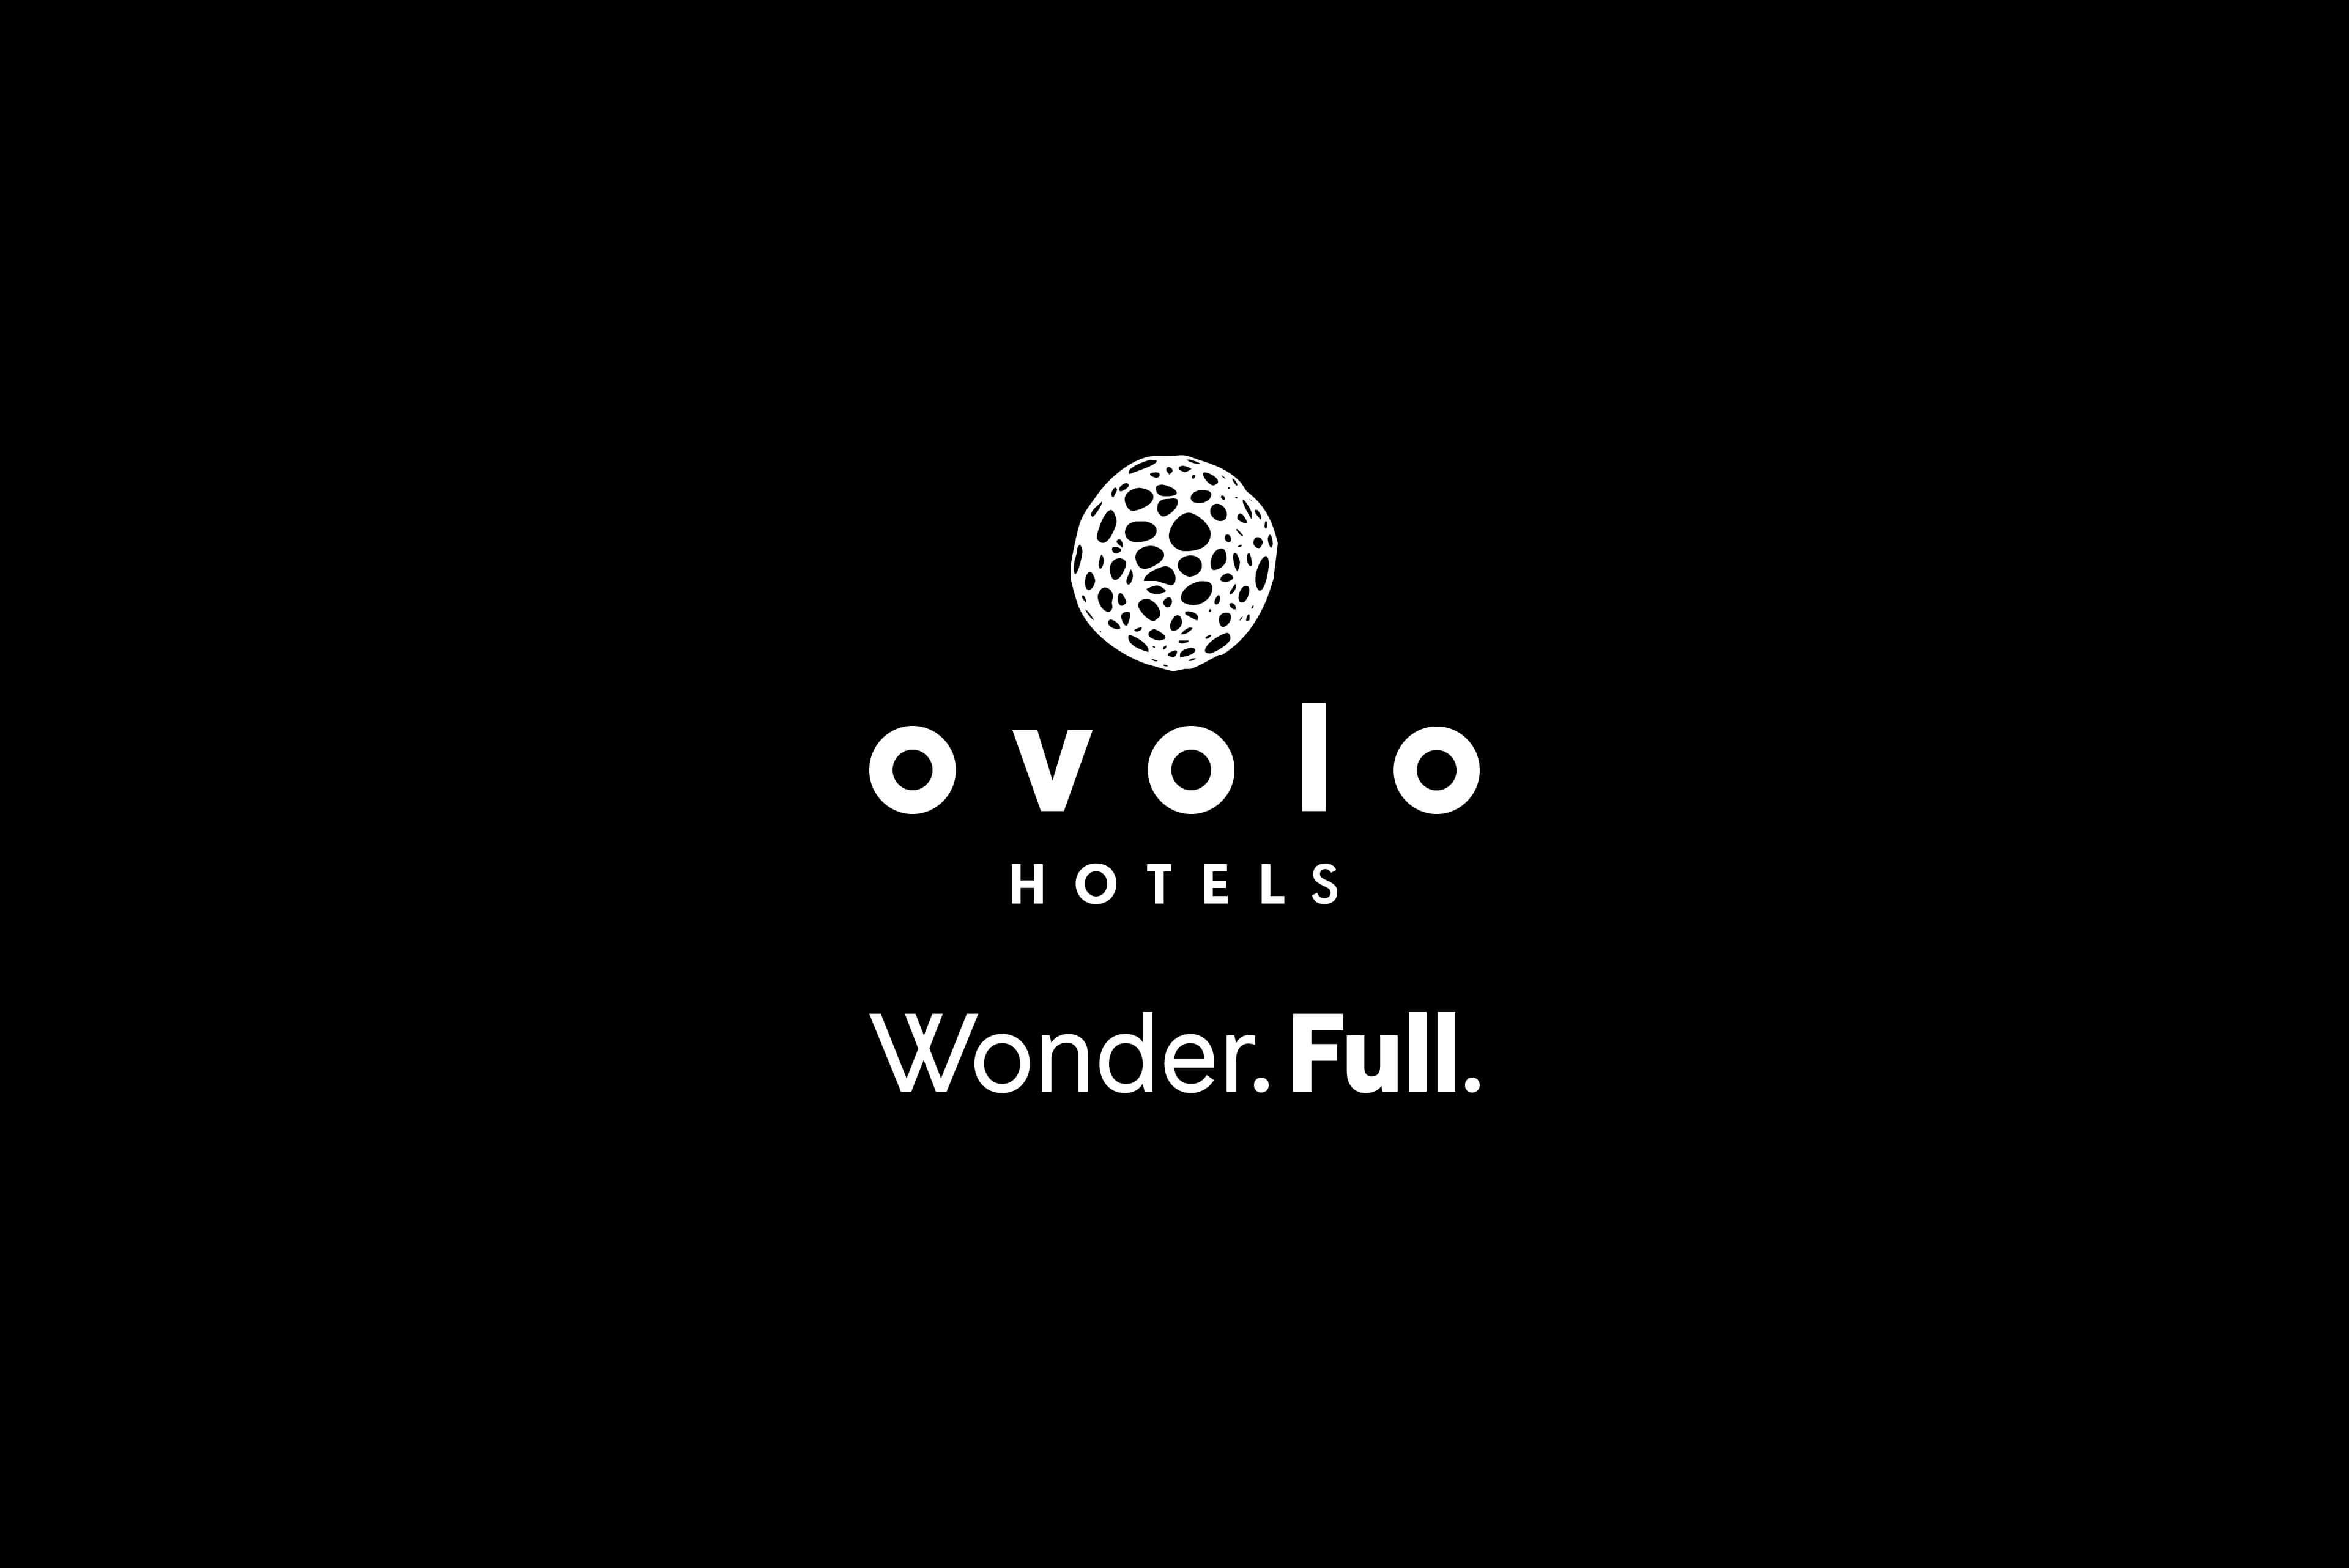 Ovolo Hotels Brand Refresh - Wonder. Full. Logo lock-up